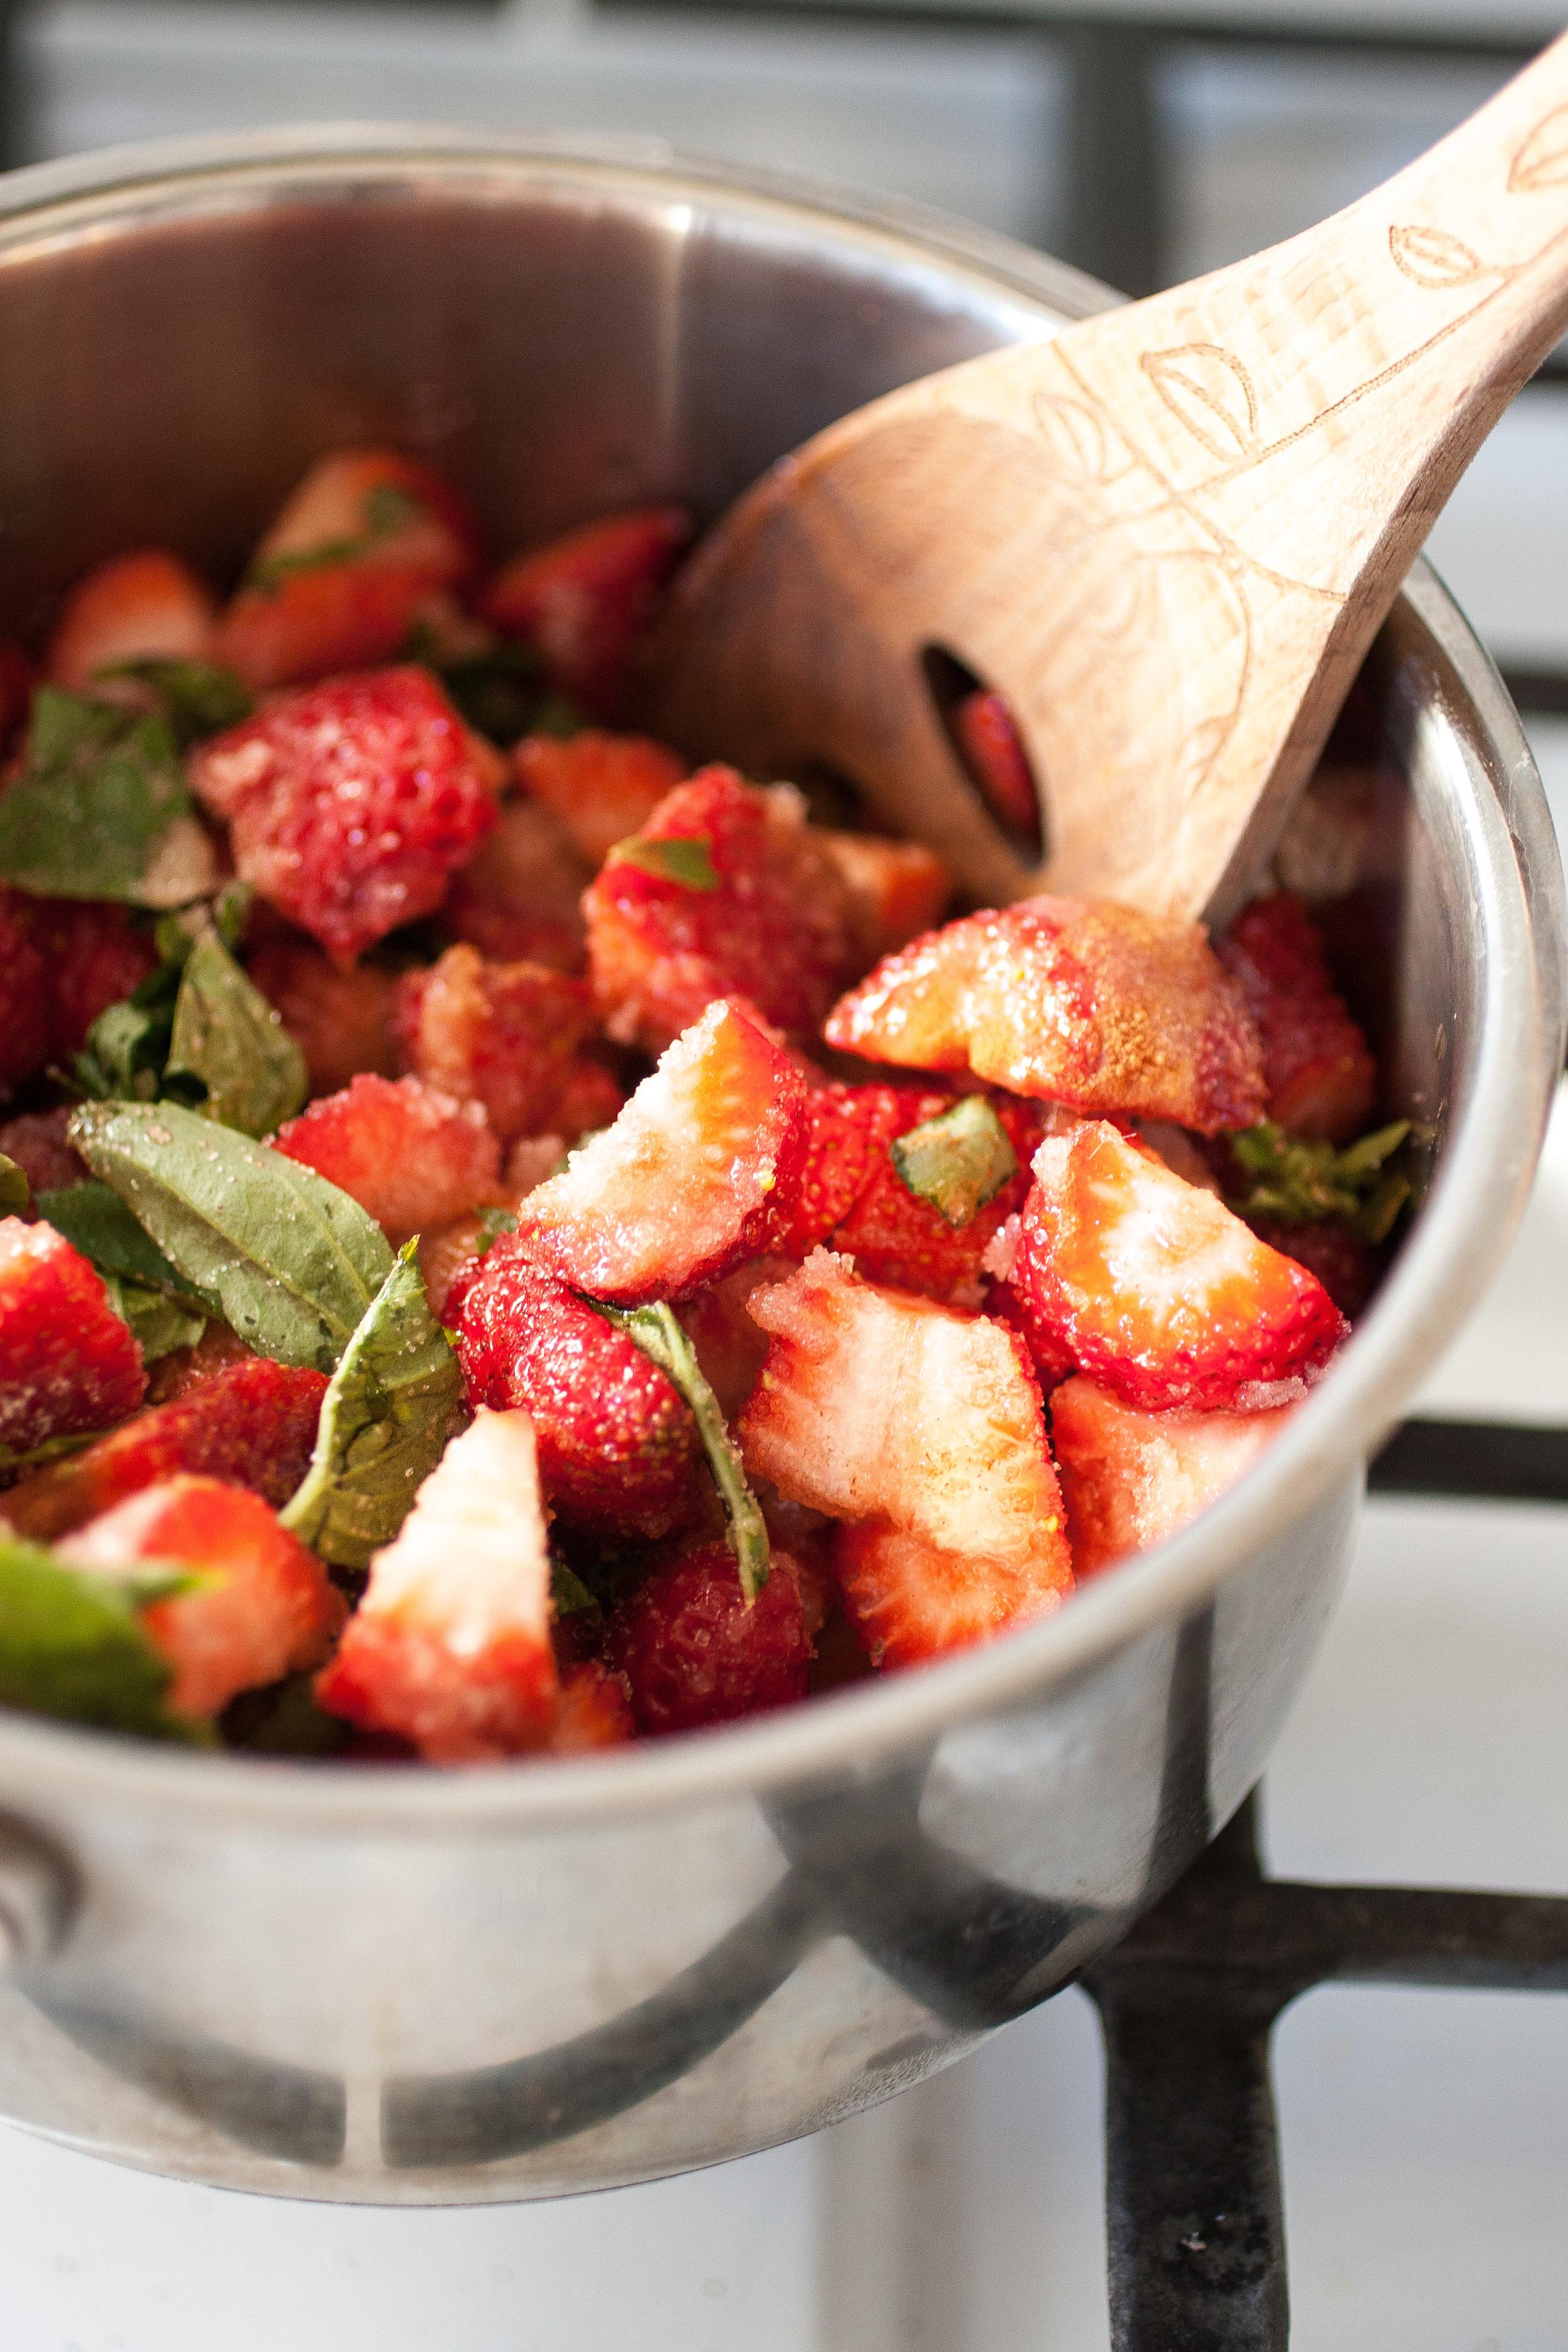 Strawberry Basil Jam or Sauce